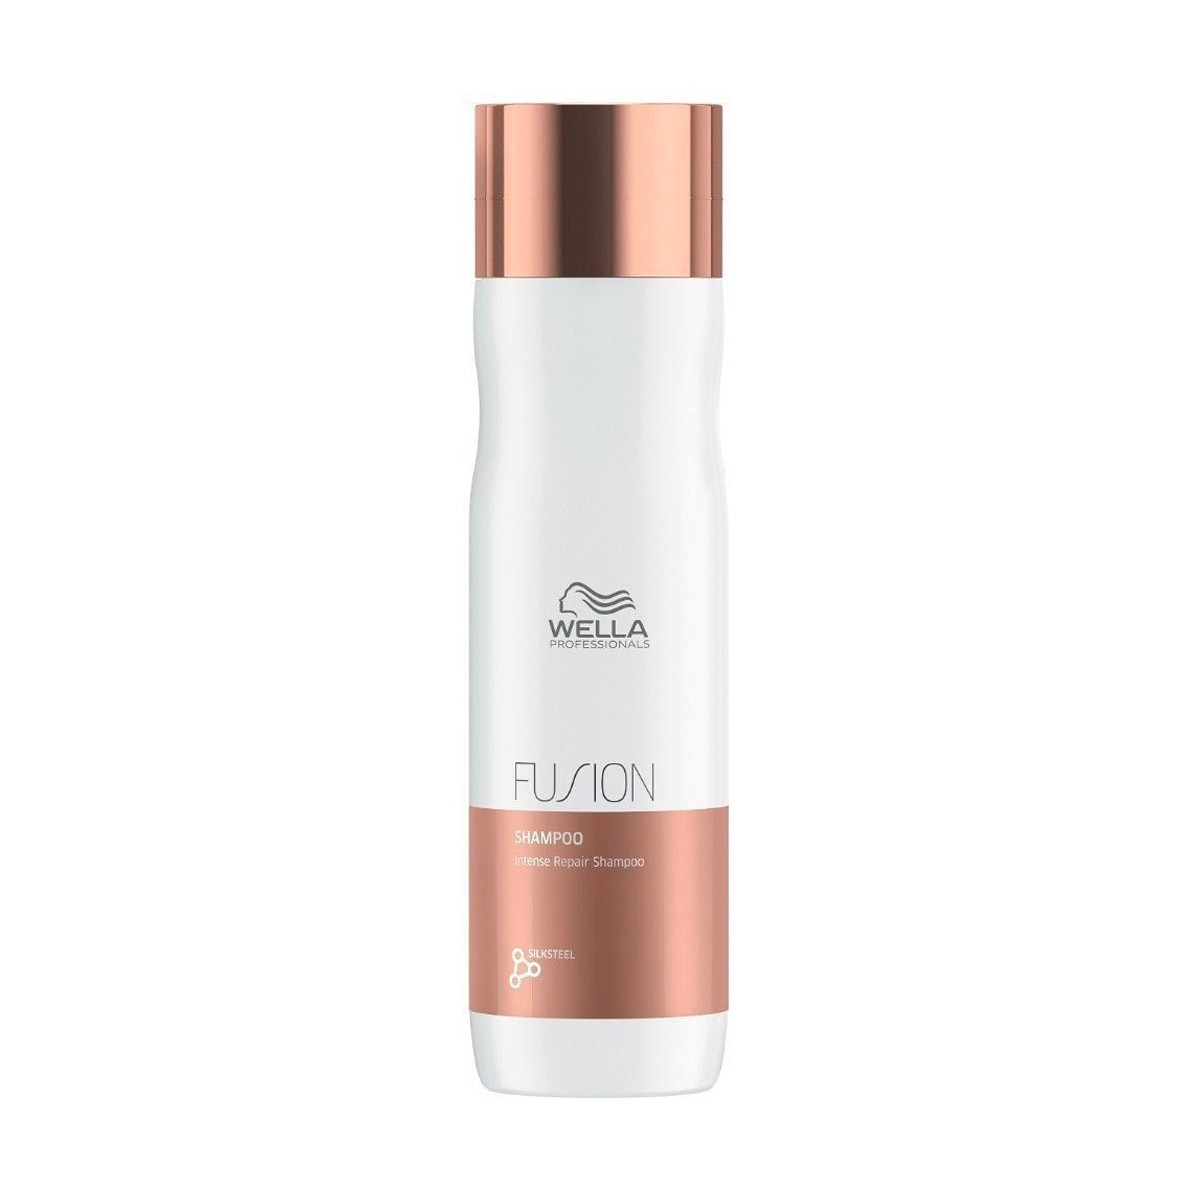 WELLA Fusion Intense Repair Shampoo 250ml - Szampon regenerujący